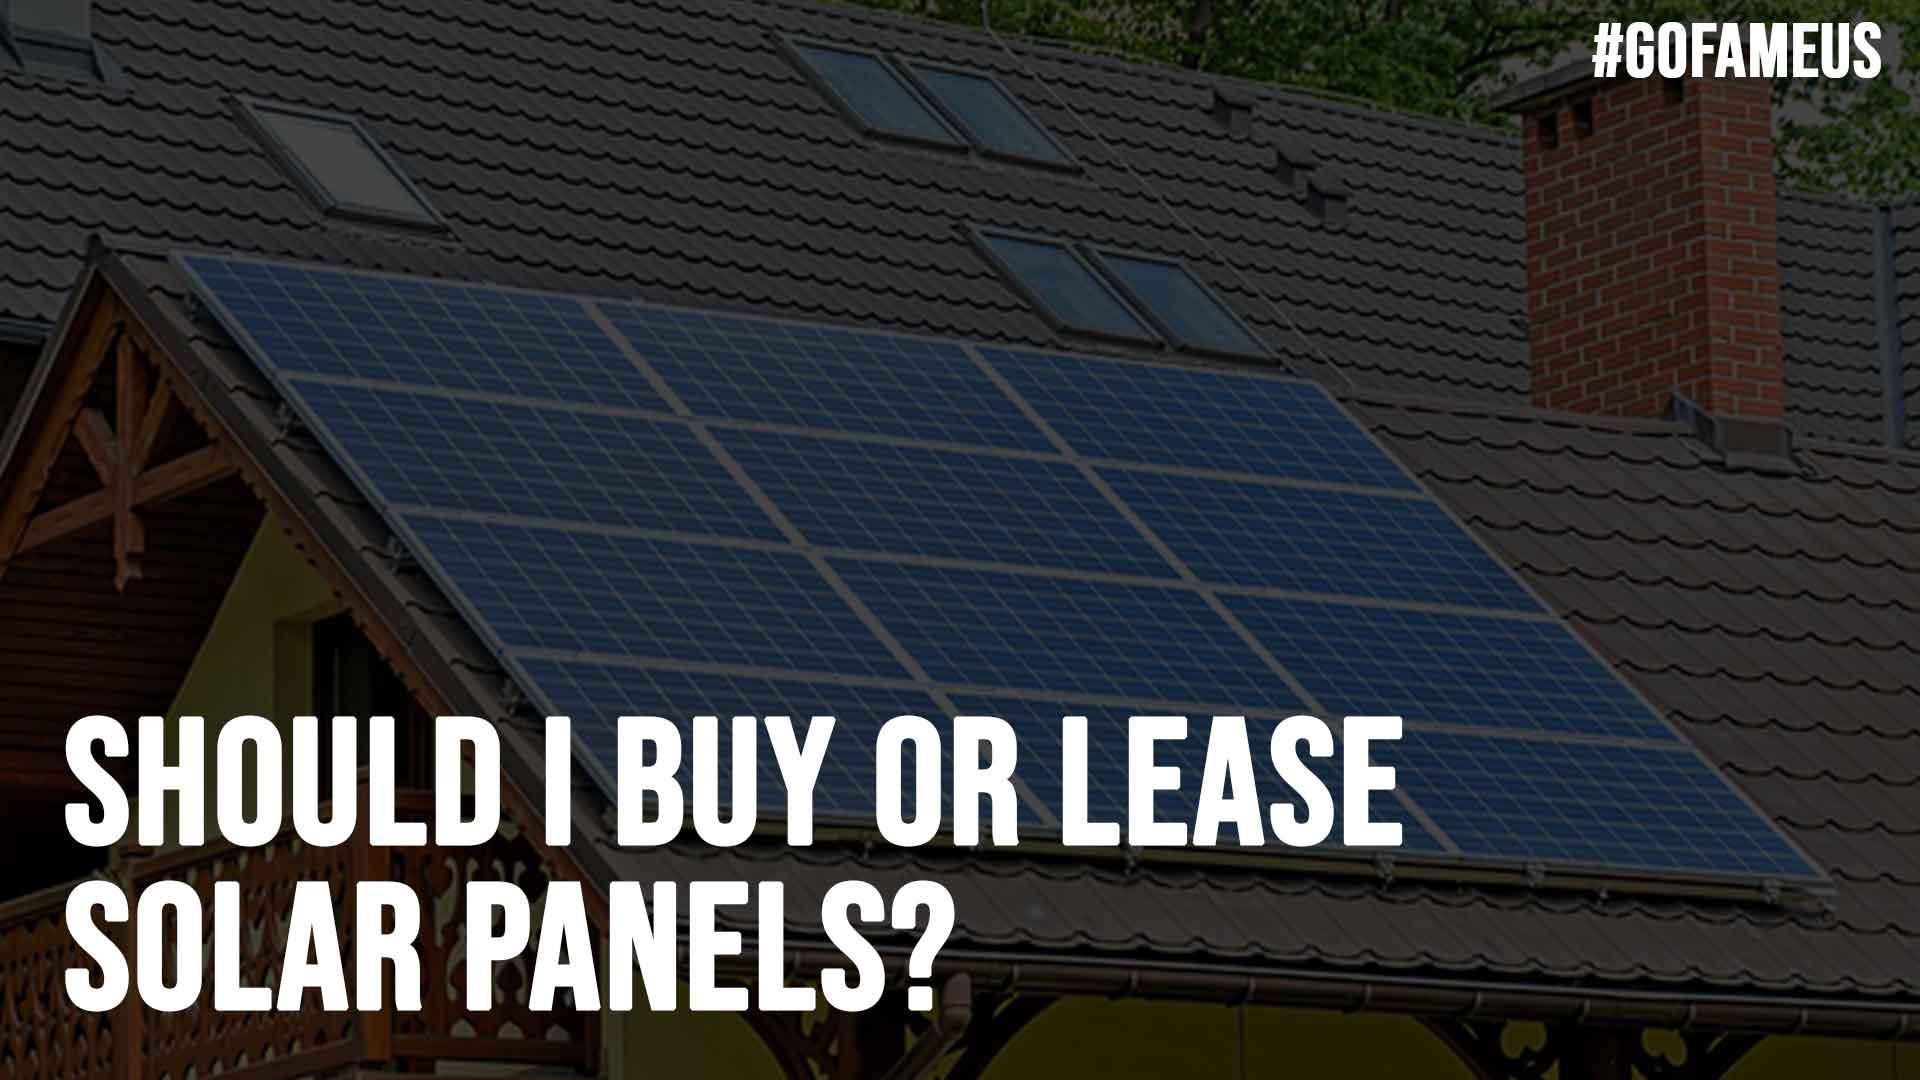 Should I Buy or Lease Solar Panels